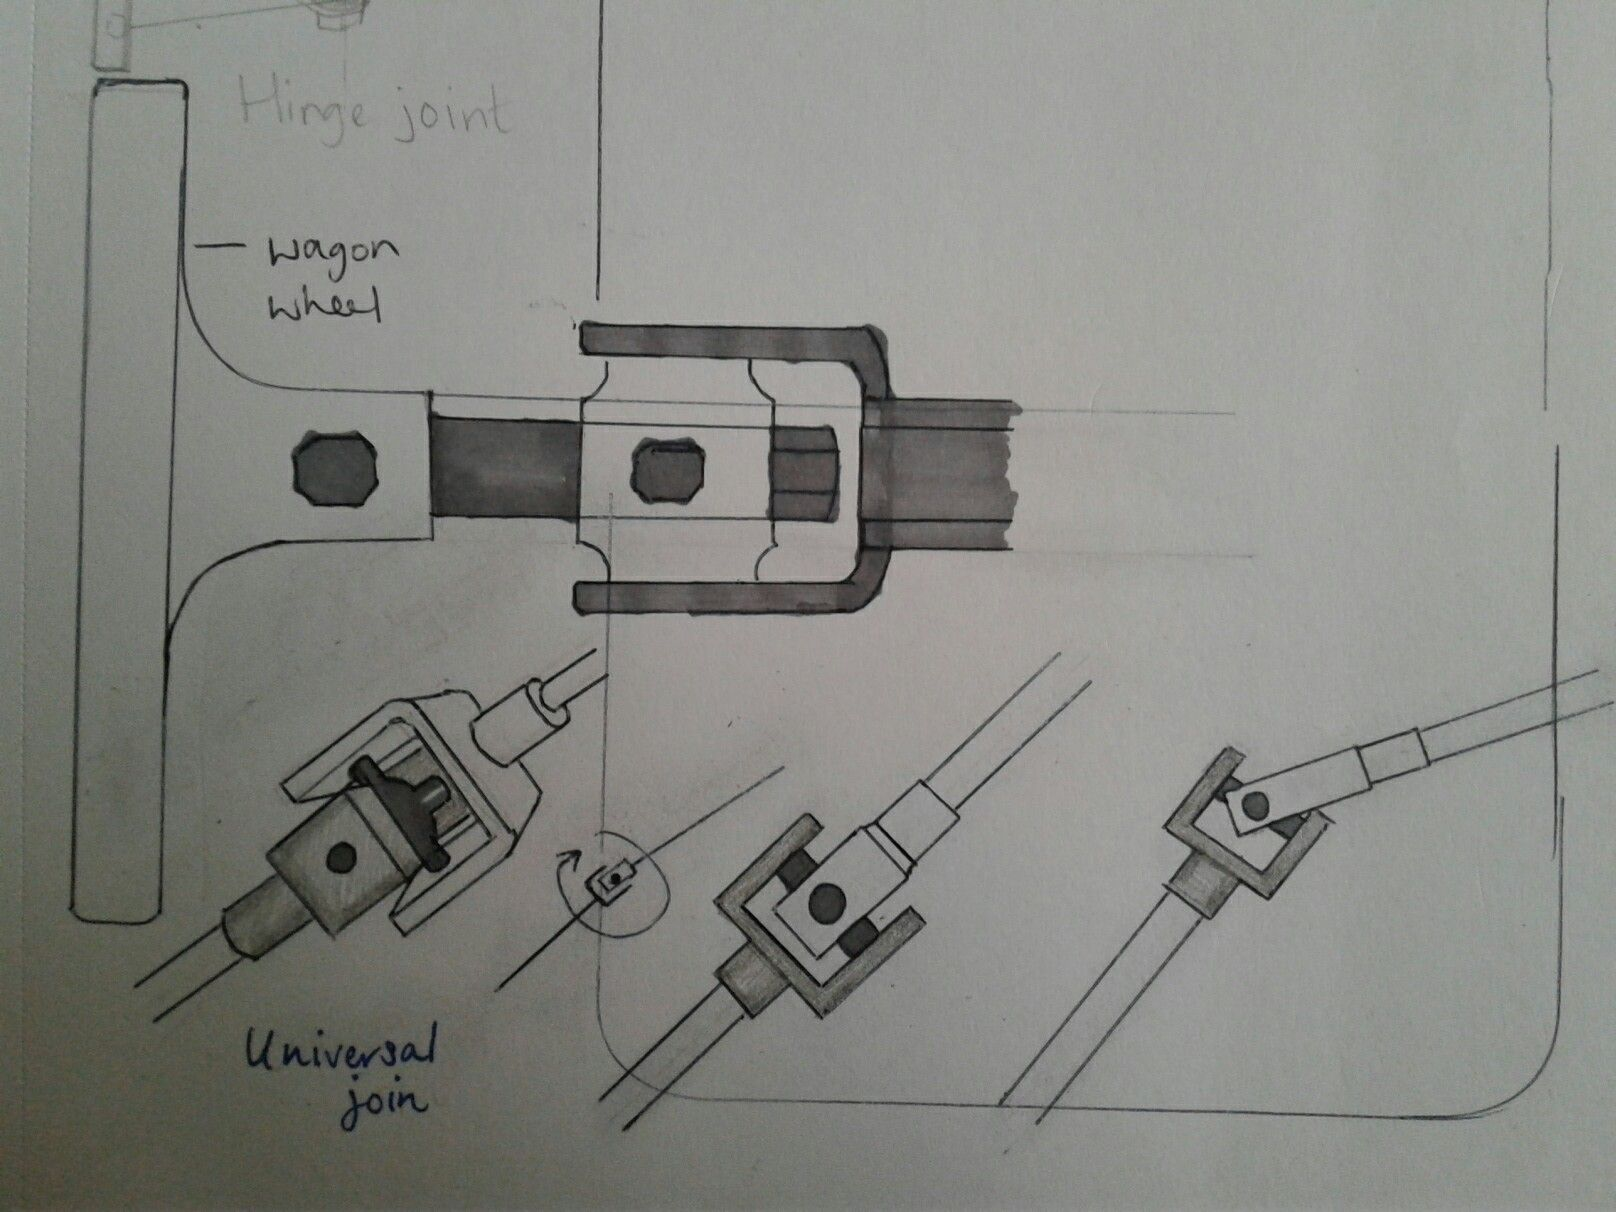 Steering Universal Joins Technology Diagram Floor